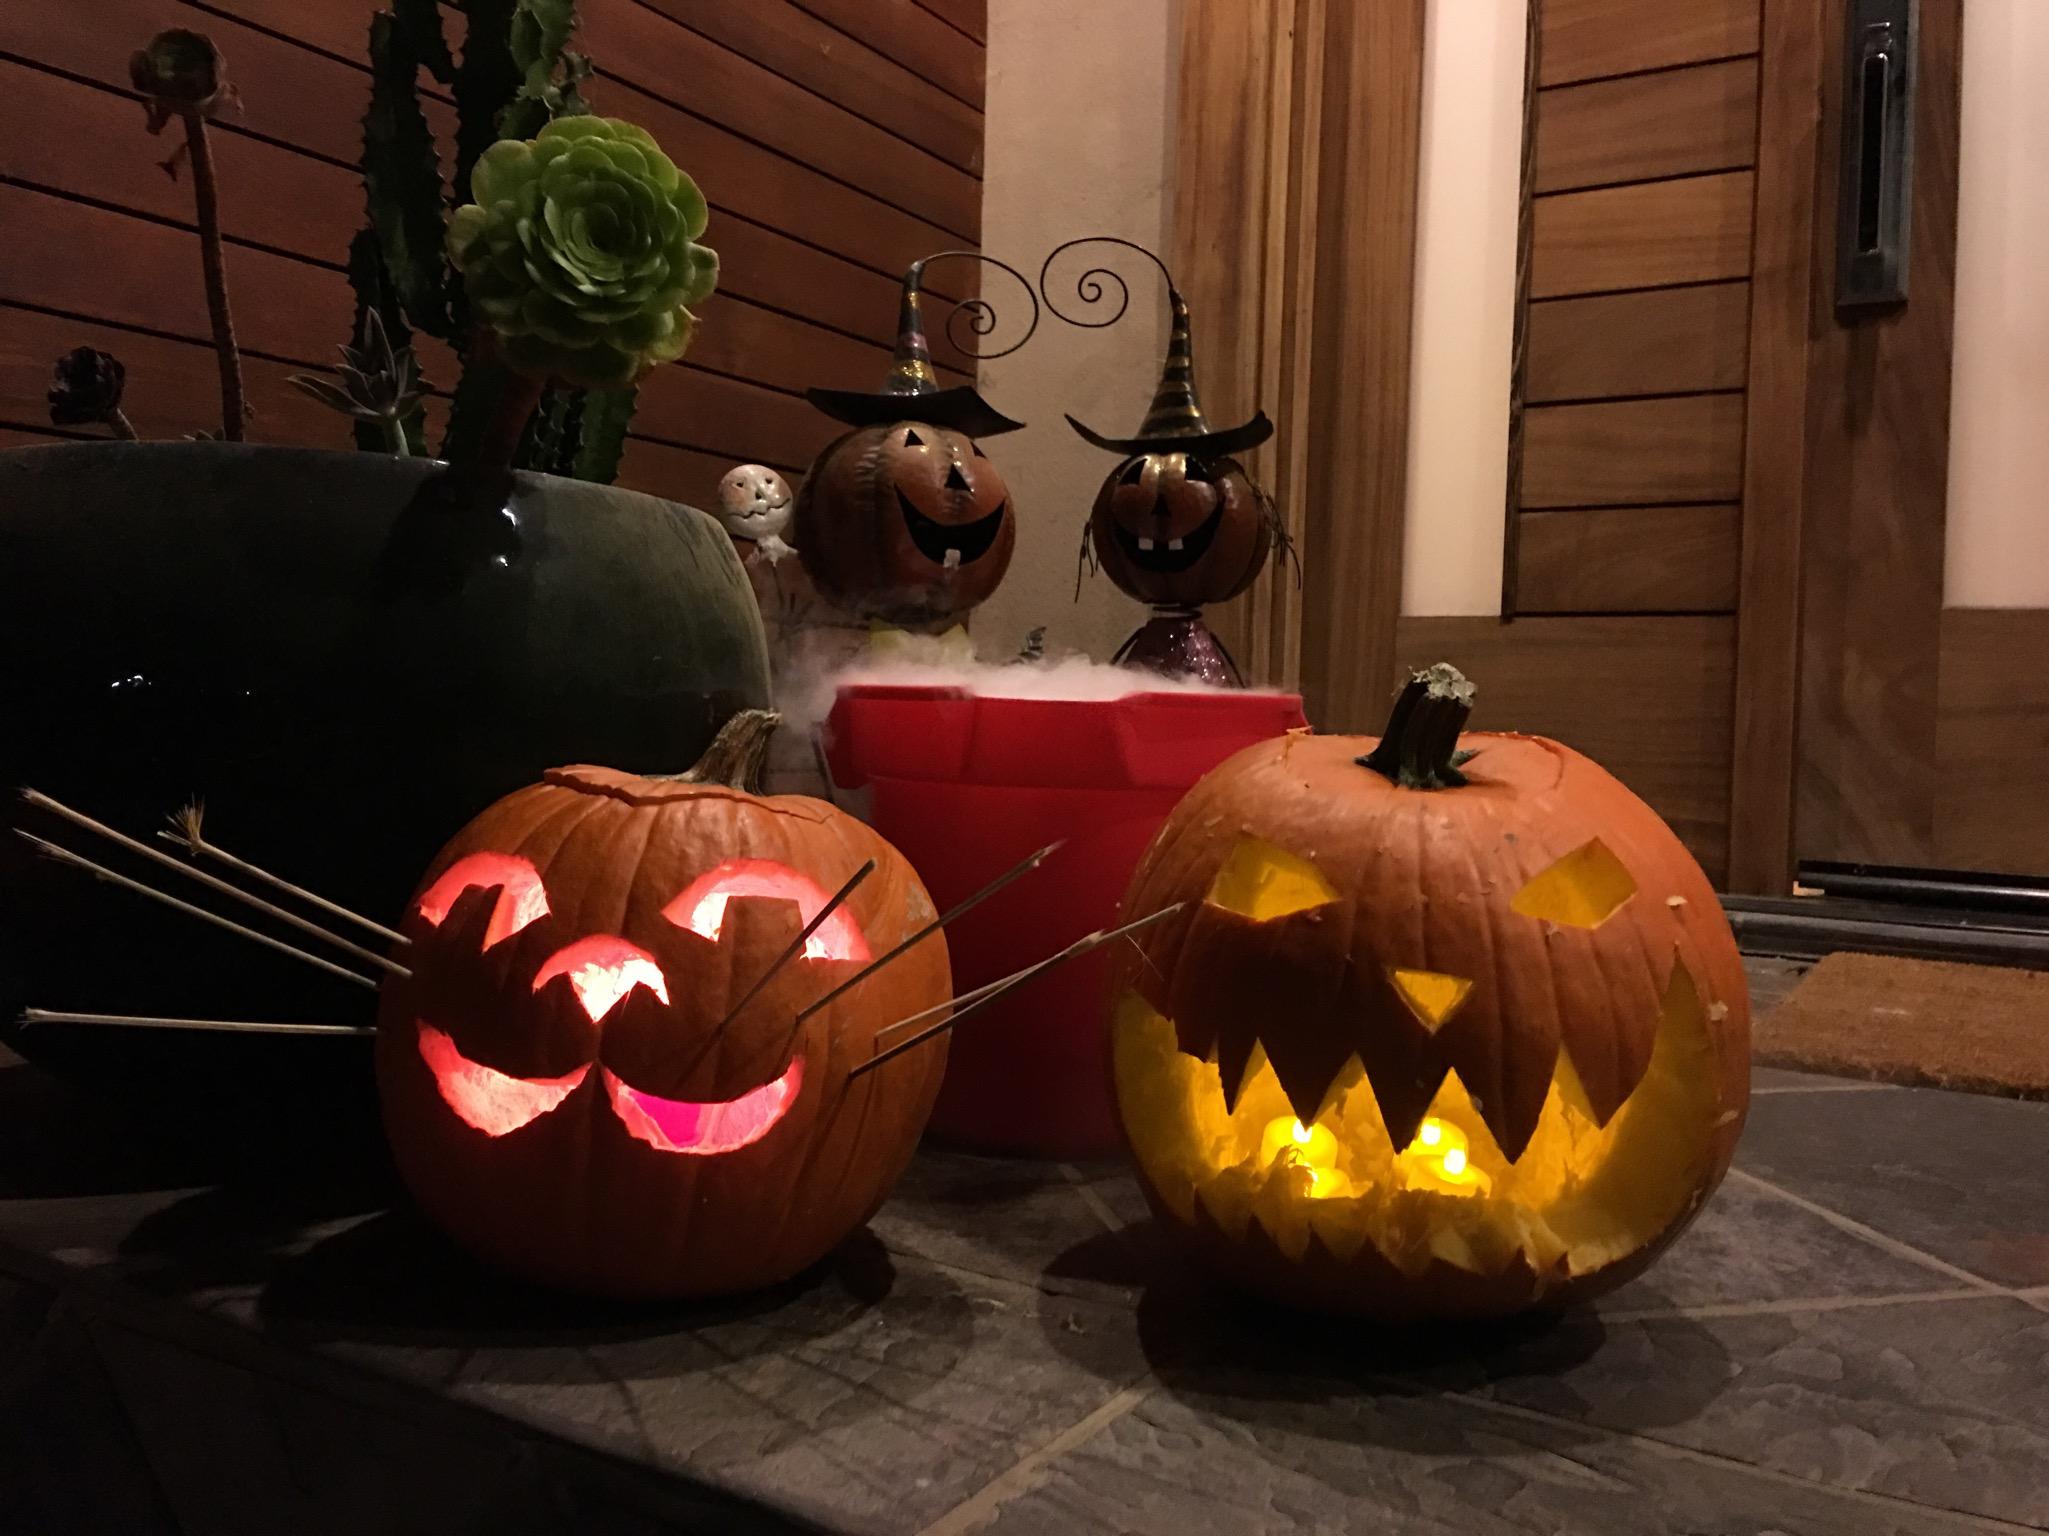 pumpkins, jack-o-lanterns